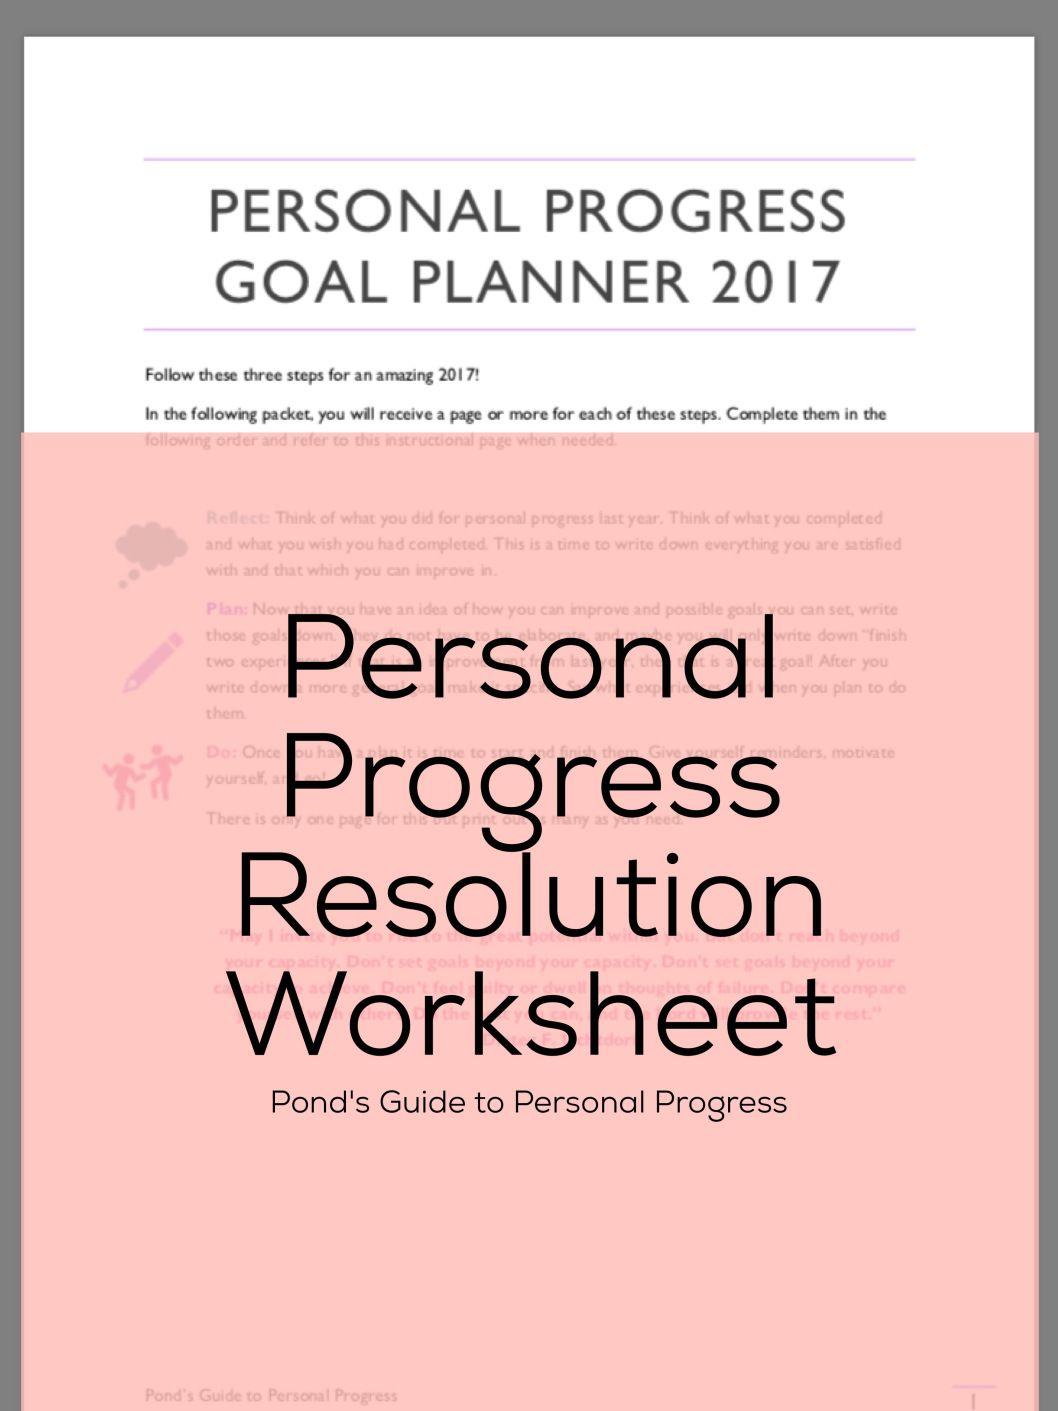 Personal Progress Resolution Worksheet